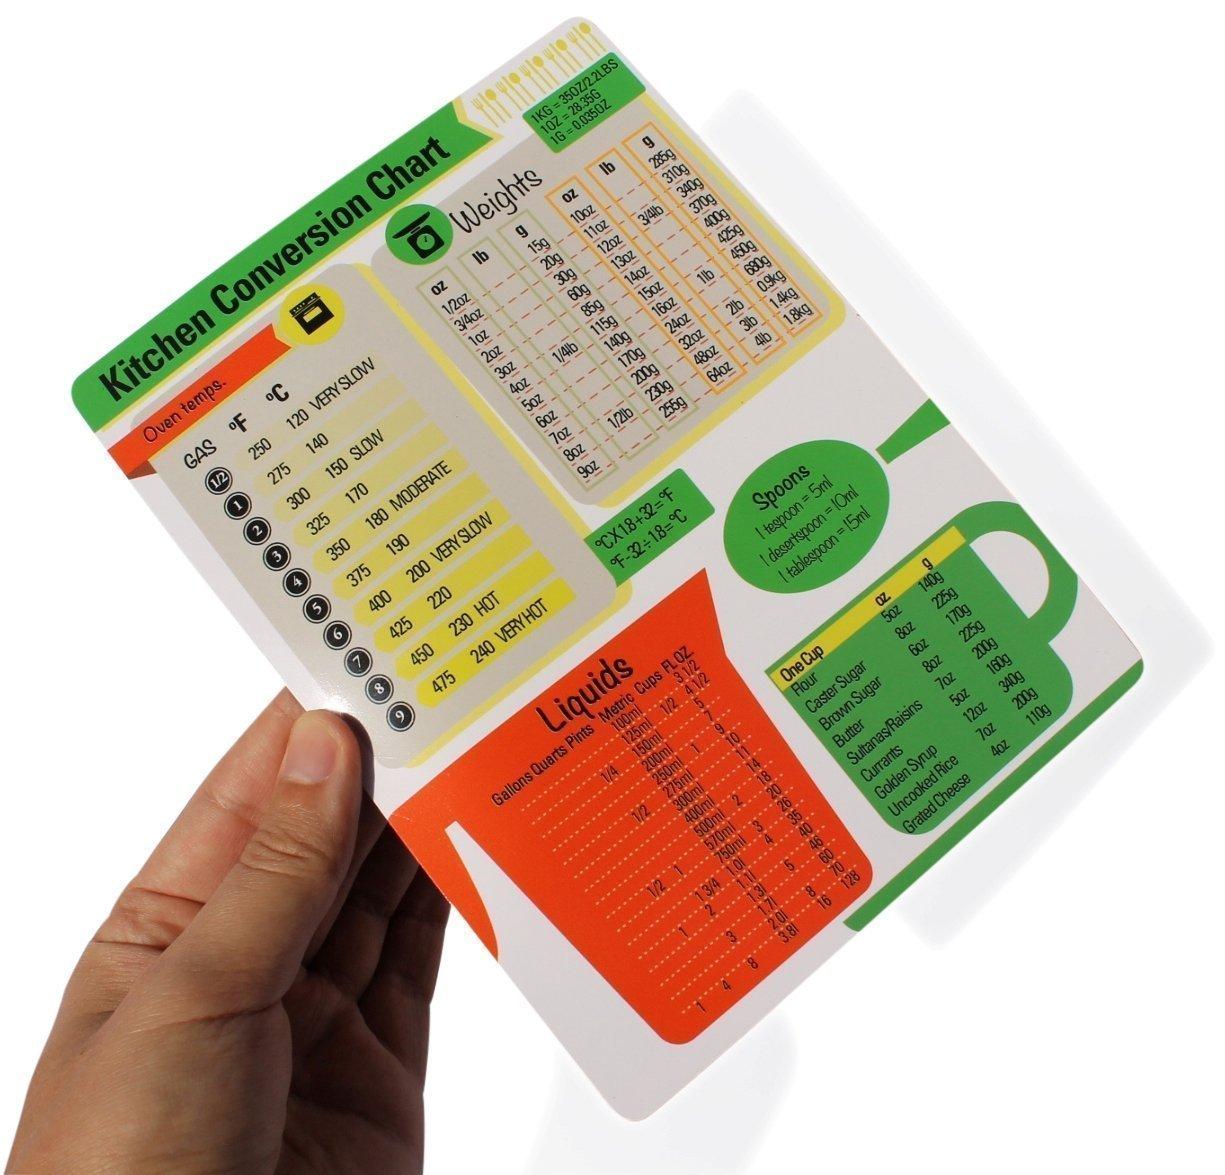 Metric conversion chart fridge magnet 6 x 8 includes weight metric conversion chart fridge magnet 6 x 8 includes weight conversion chart measurement conversion chart liquid conversion chart and temperature nvjuhfo Choice Image